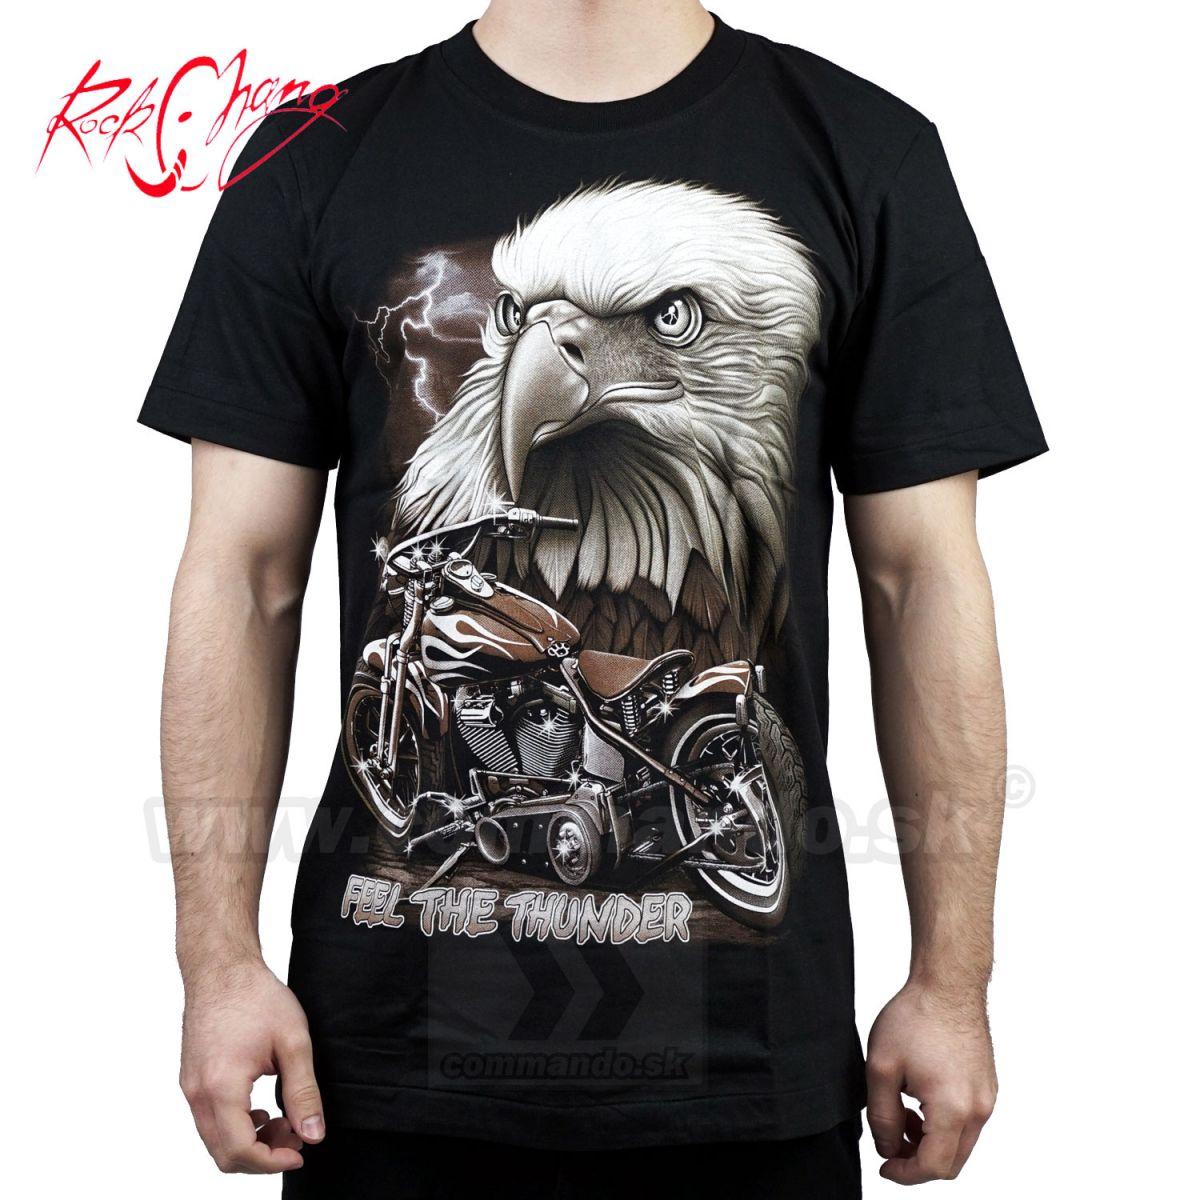 1be1165e4adf Tričko Feel The Thunder Rock Chang 4407 Motorcycle TShirt